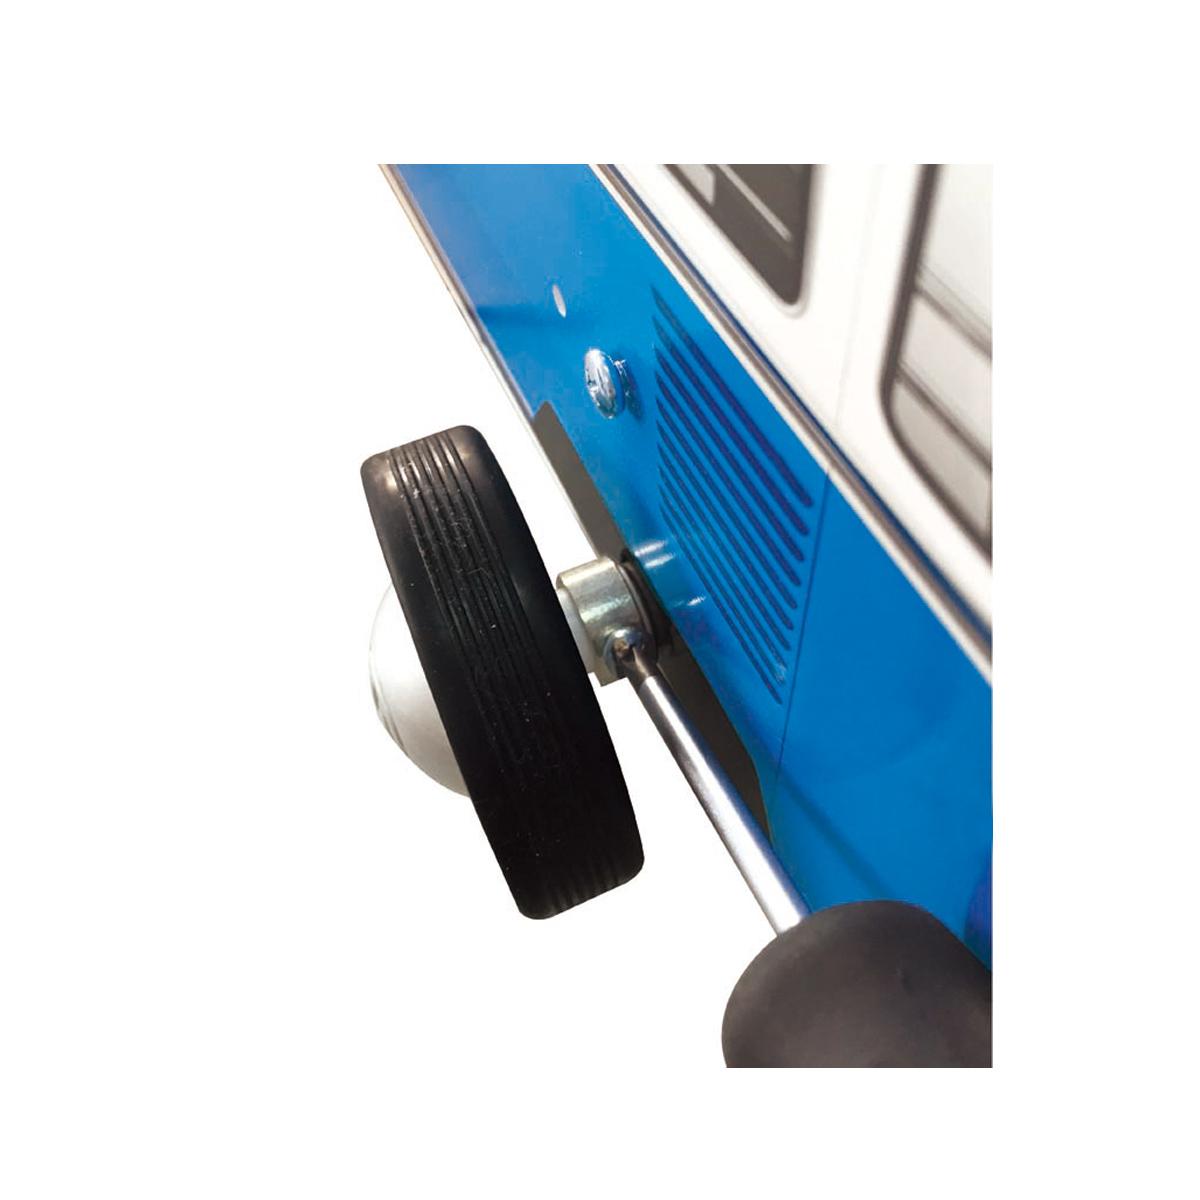 Hape E0381 Lauflernwagen Bulli in blau Holzspielzeug